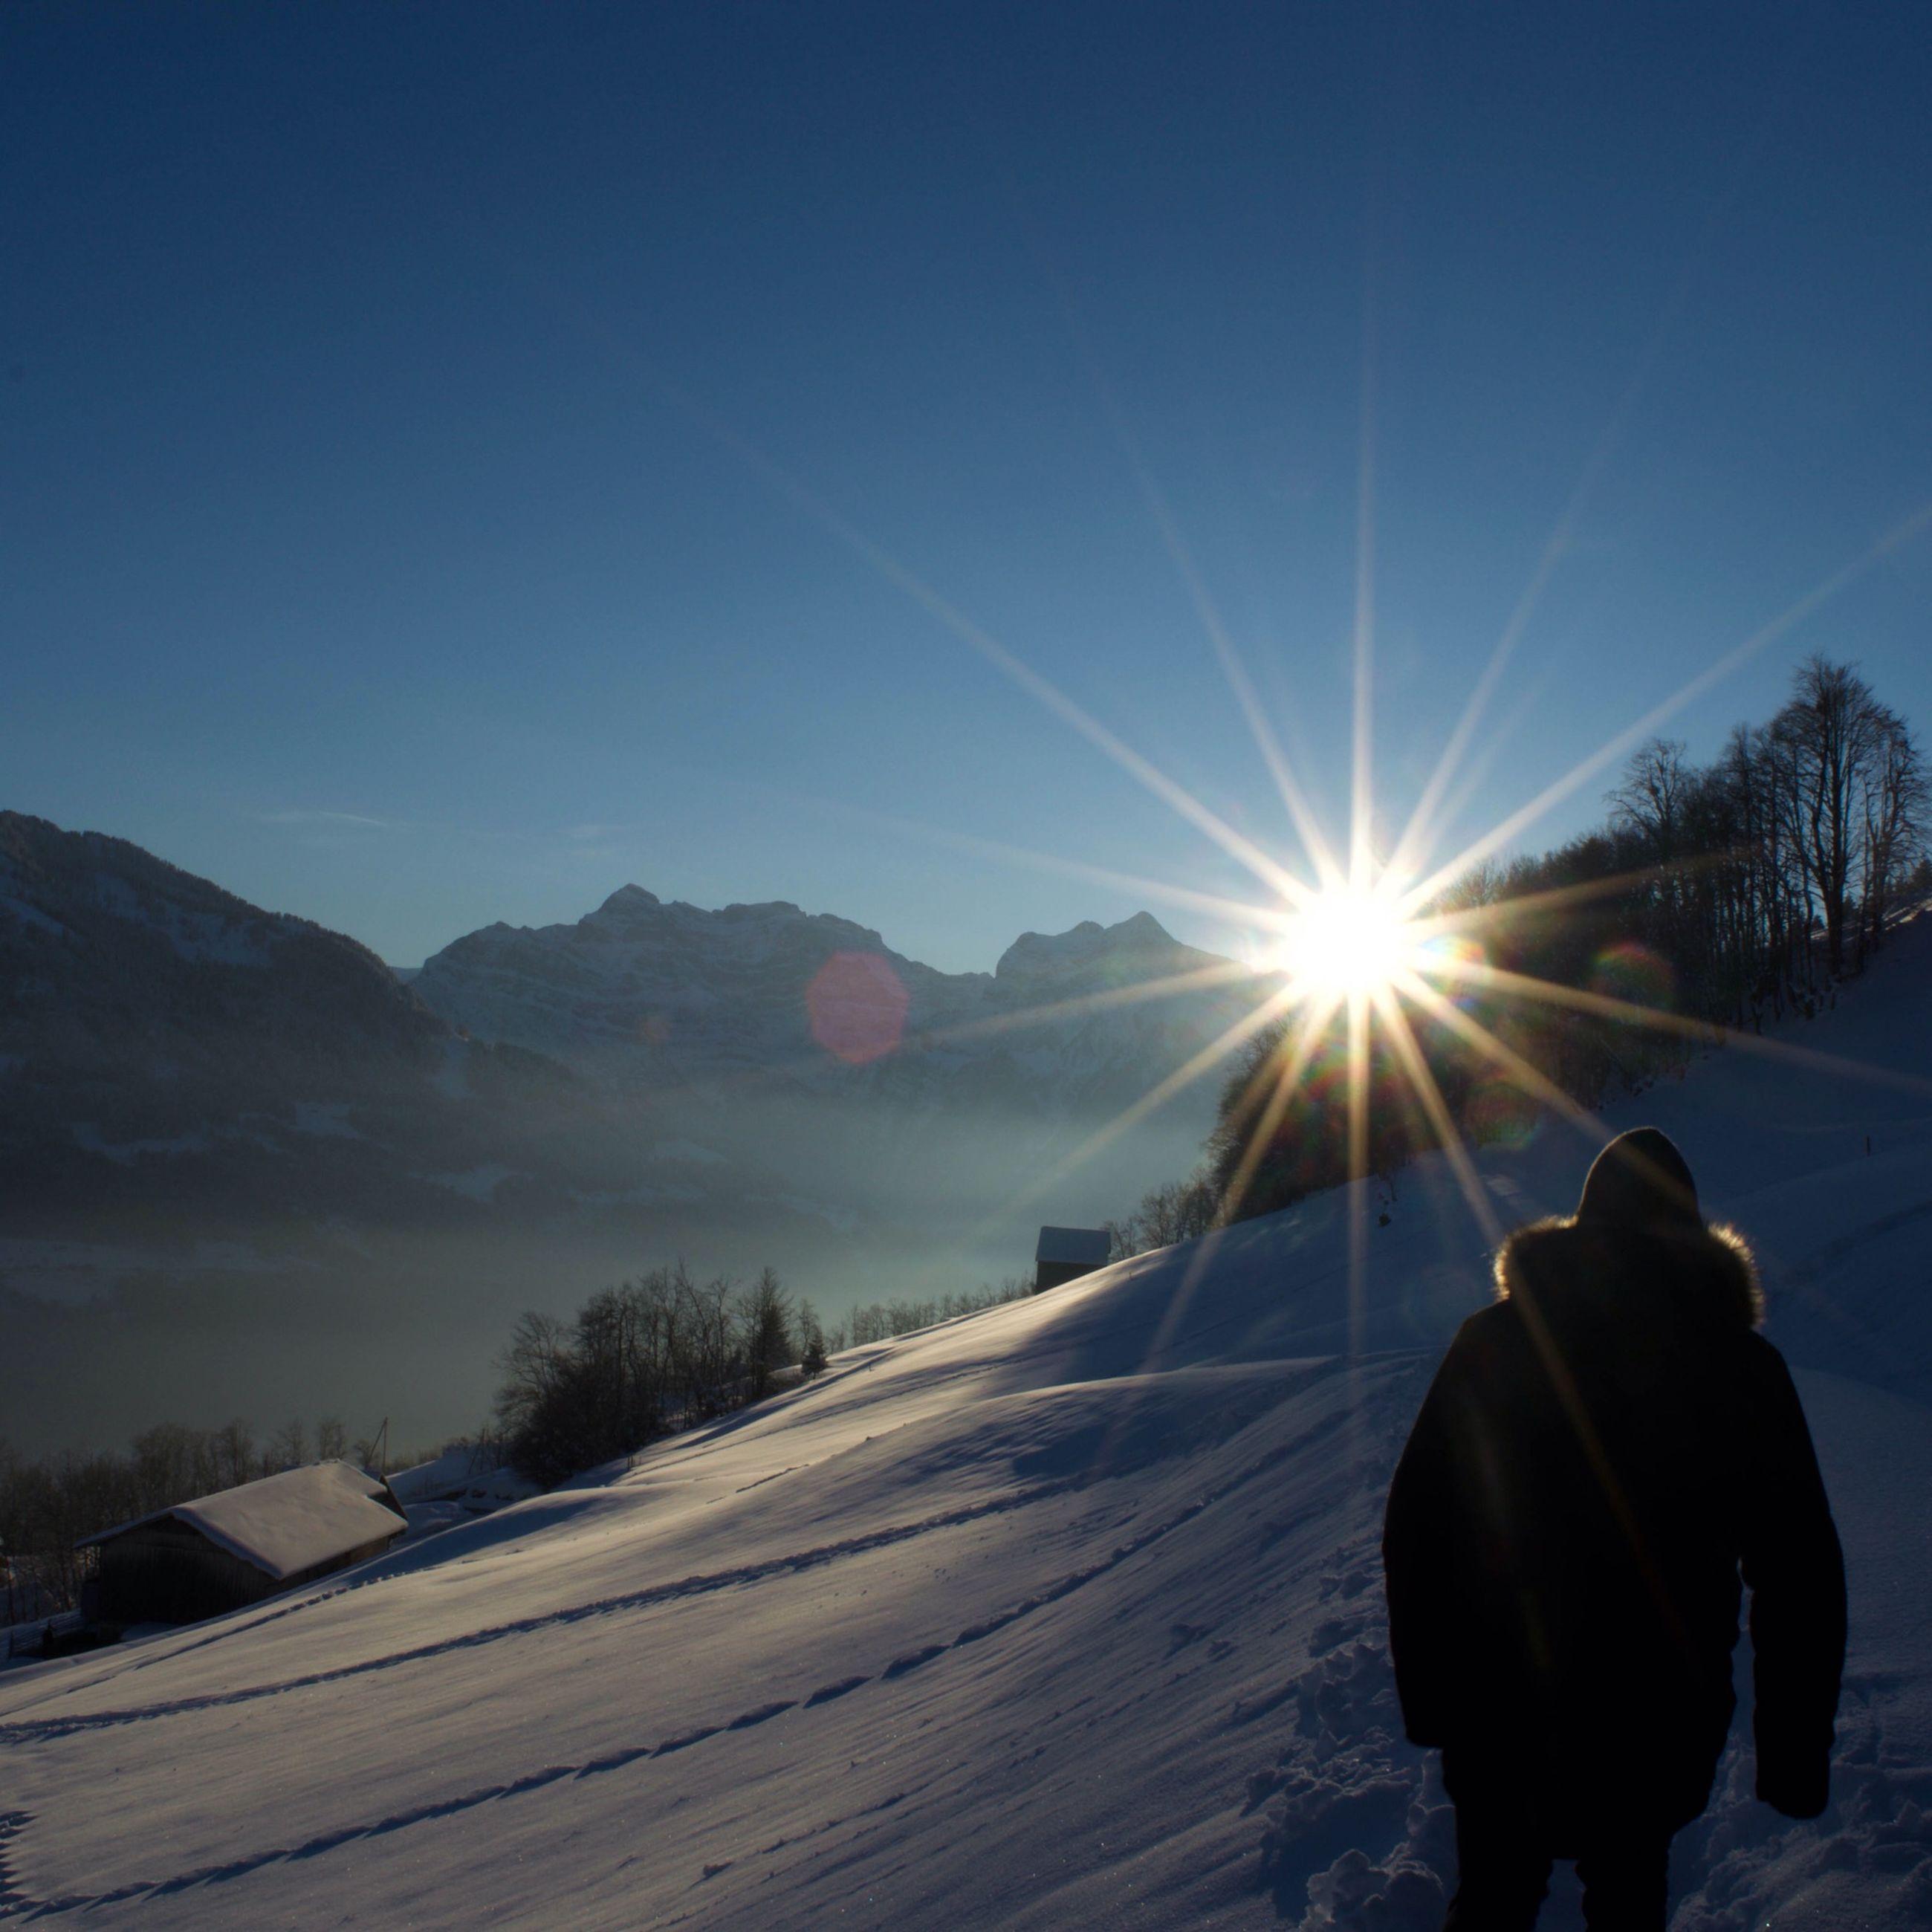 sun, sunlight, sunbeam, clear sky, lens flare, snow, winter, men, sky, cold temperature, lifestyles, leisure activity, mountain, transportation, blue, copy space, rear view, silhouette